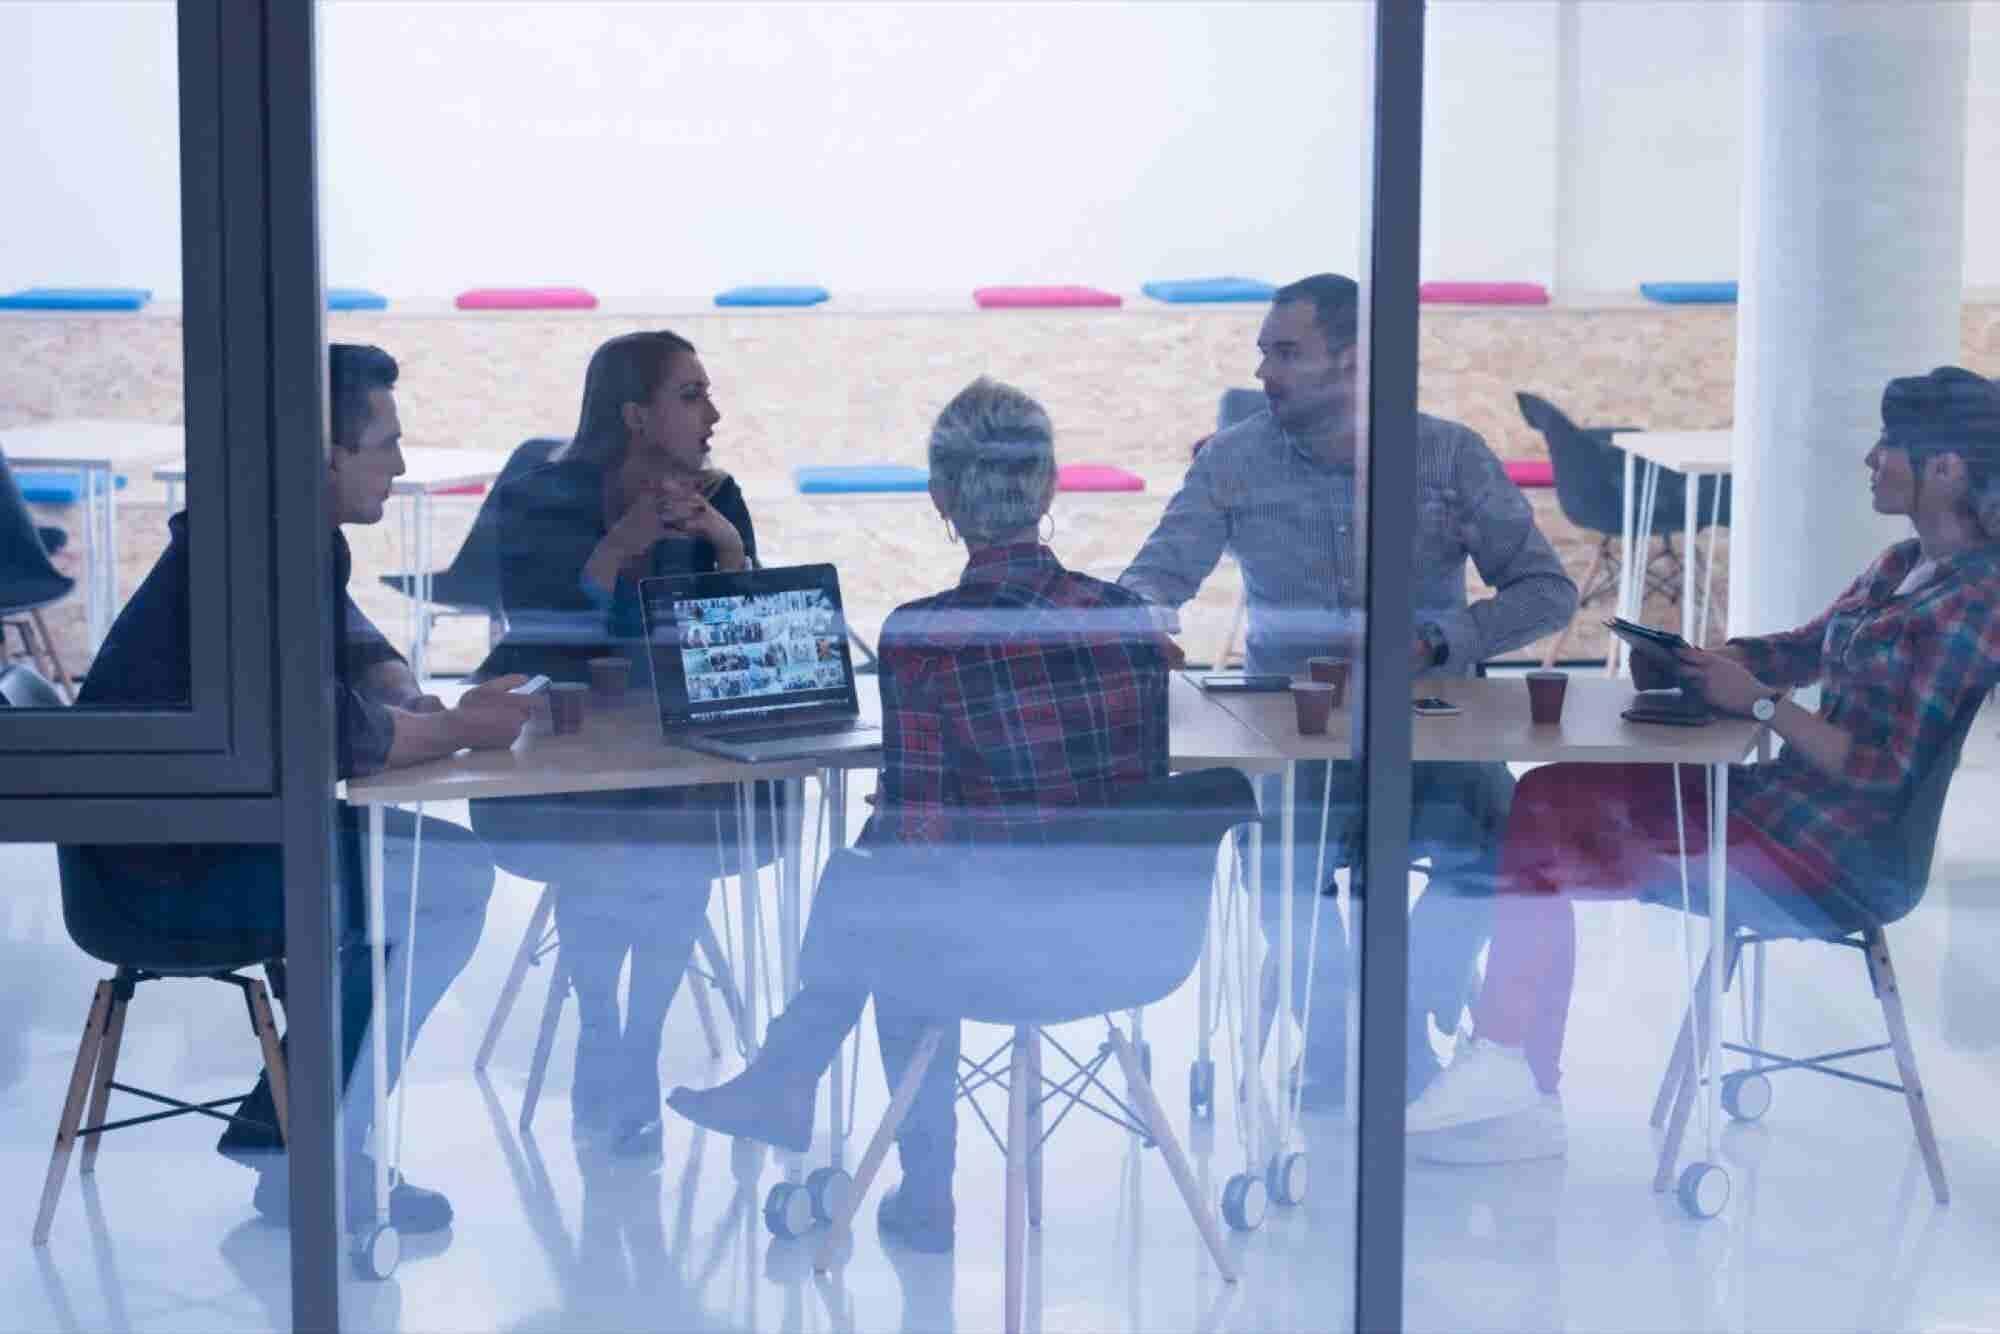 3 Things U.S. Startups Do Better Than European Startups